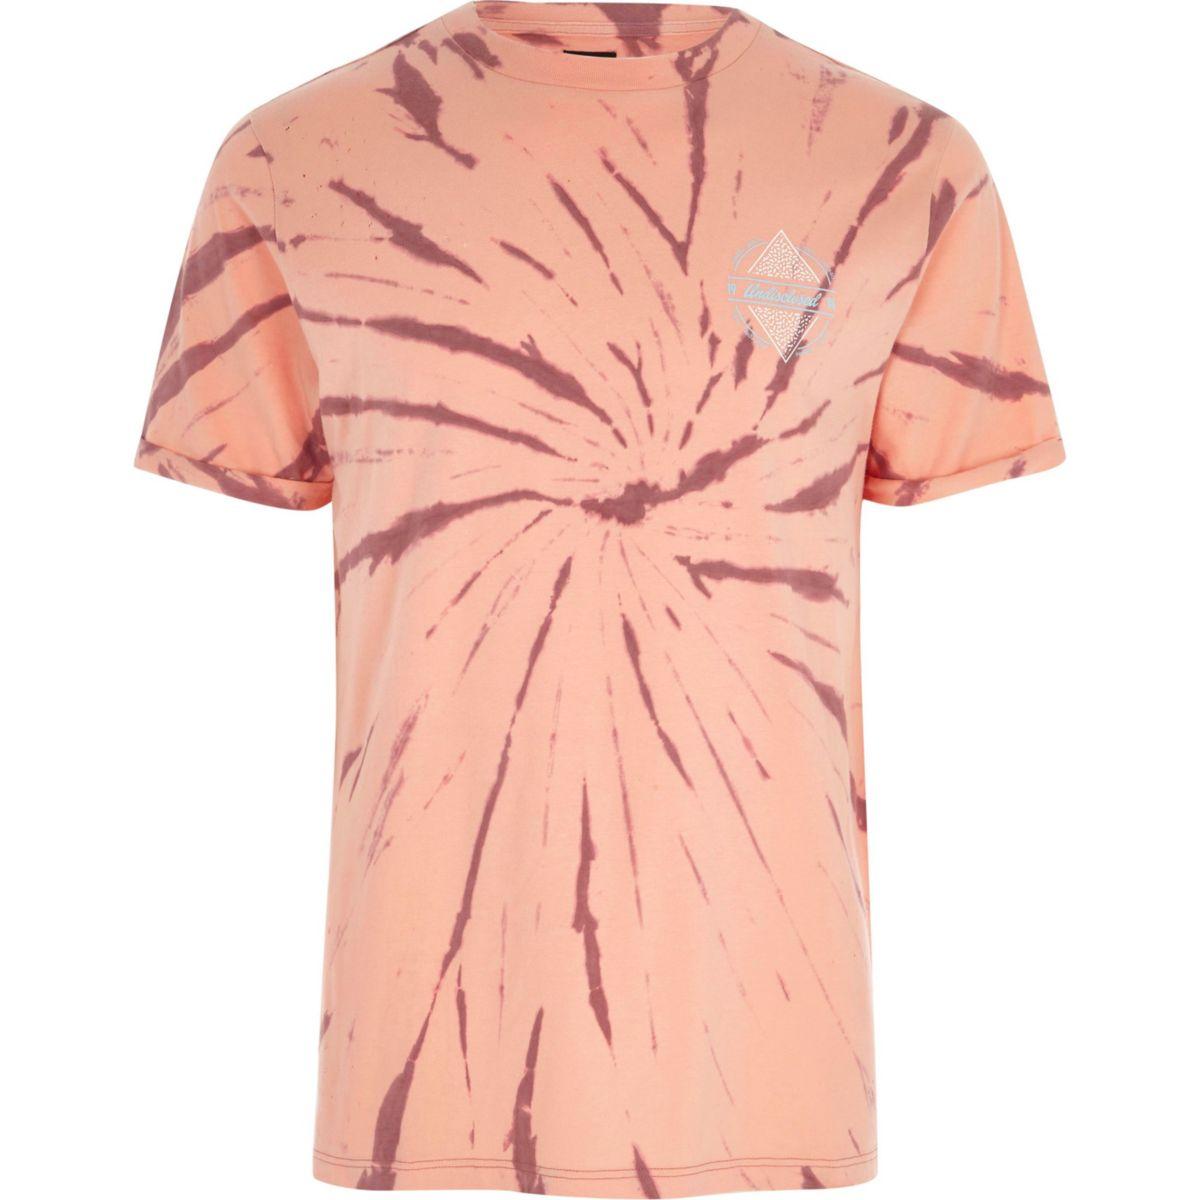 Orange tie dye 'undisclosed' print T-shirt